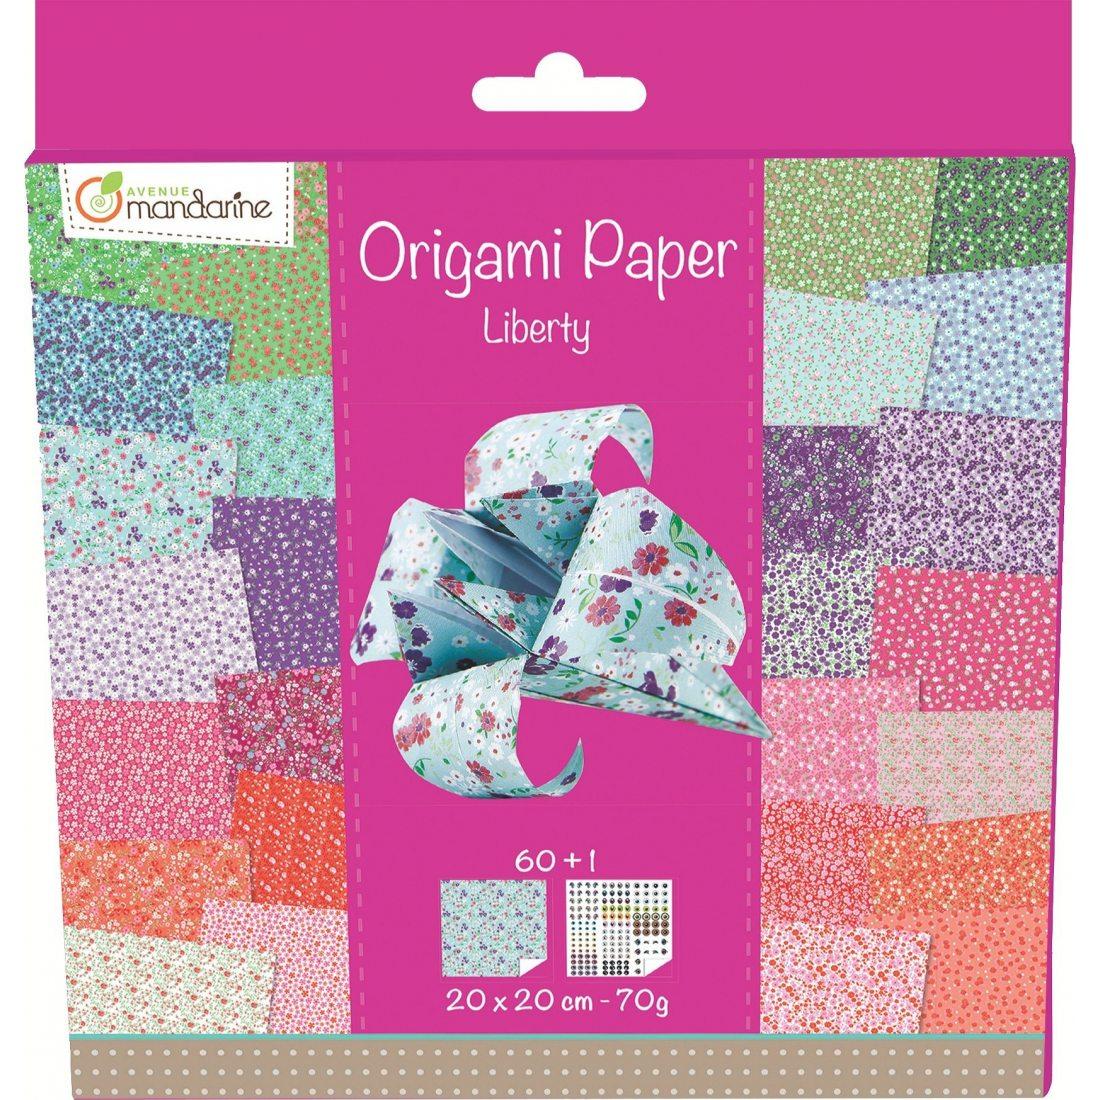 Avenue Mandarine 52509O Une pochette Origami Paper Liberty - 20 x 20 cm - 60 Feuilles - 70 g